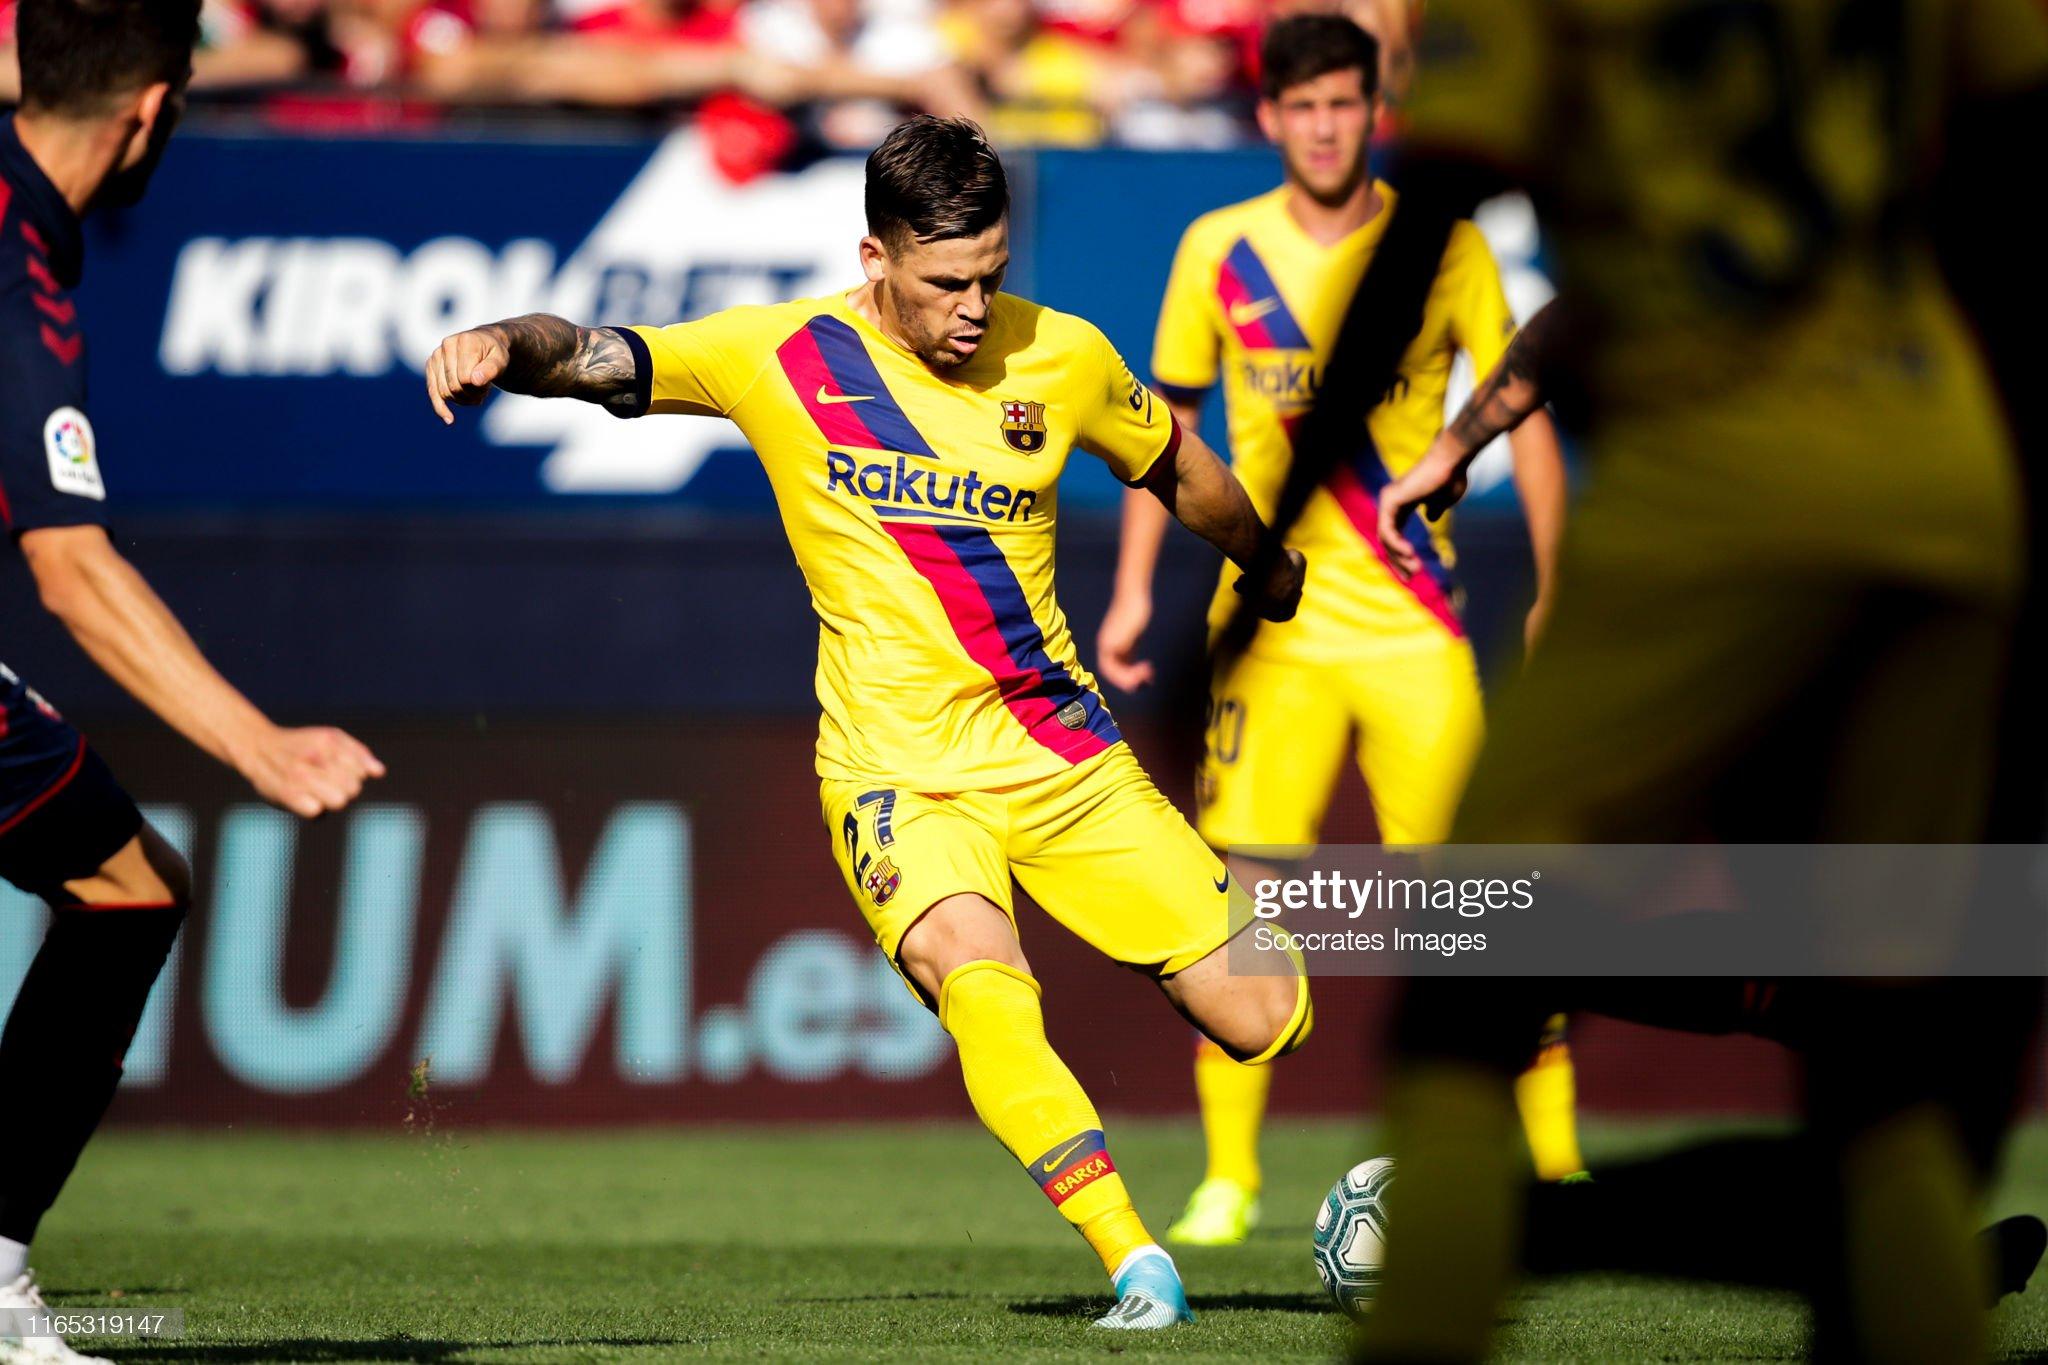 صور مباراة : أوساسونا - برشلونة 2-2 ( 31-08-2019 )  Carles-perez-of-fc-barcelona-during-the-la-liga-santander-match-v-picture-id1165319147?s=2048x2048